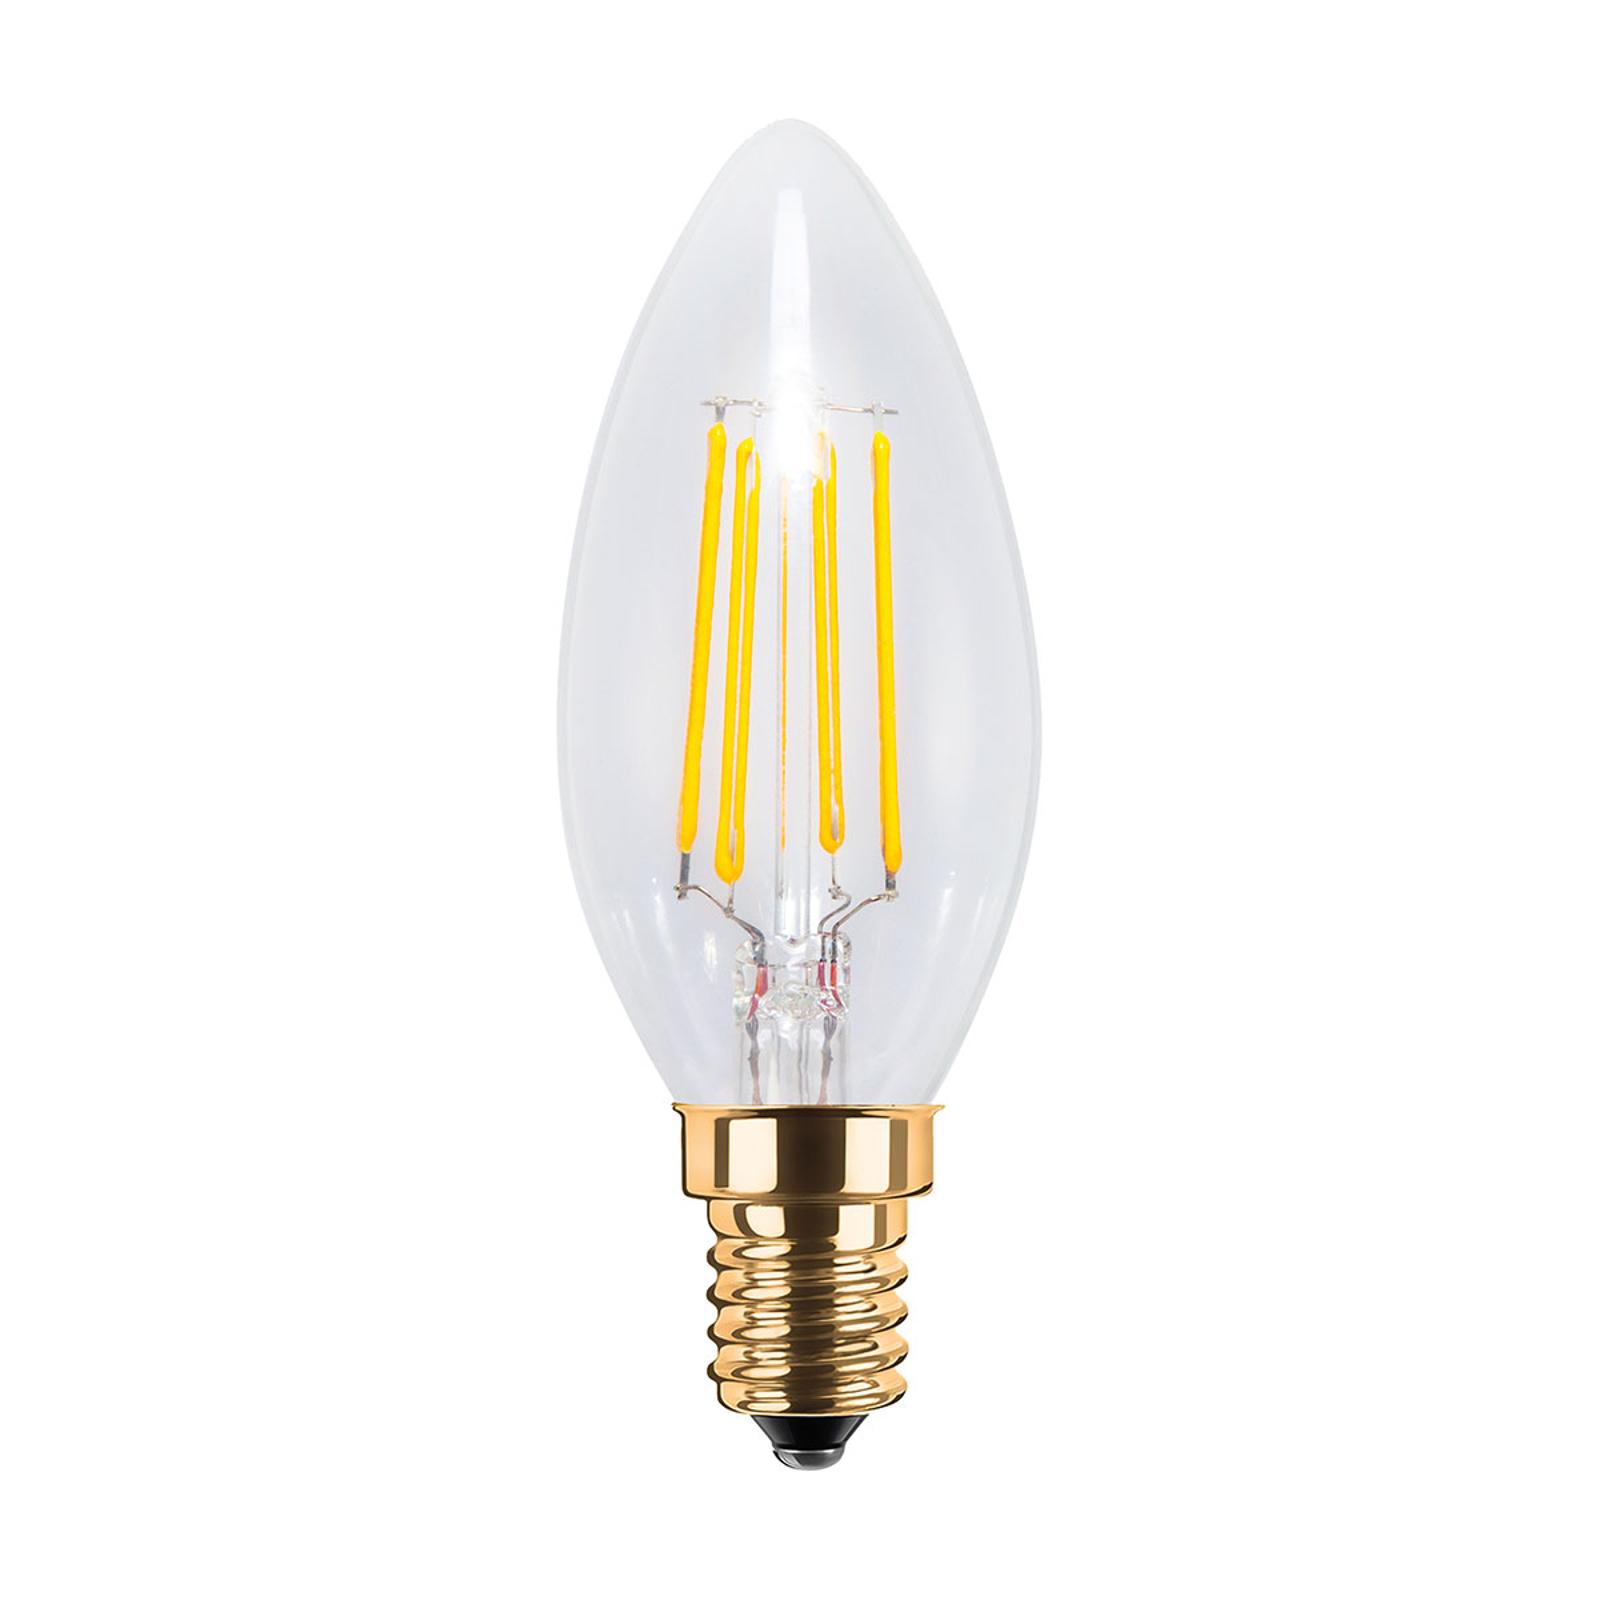 LED-kynttilälamppu E14 4W, 2 200K, 320 lm, kirkas